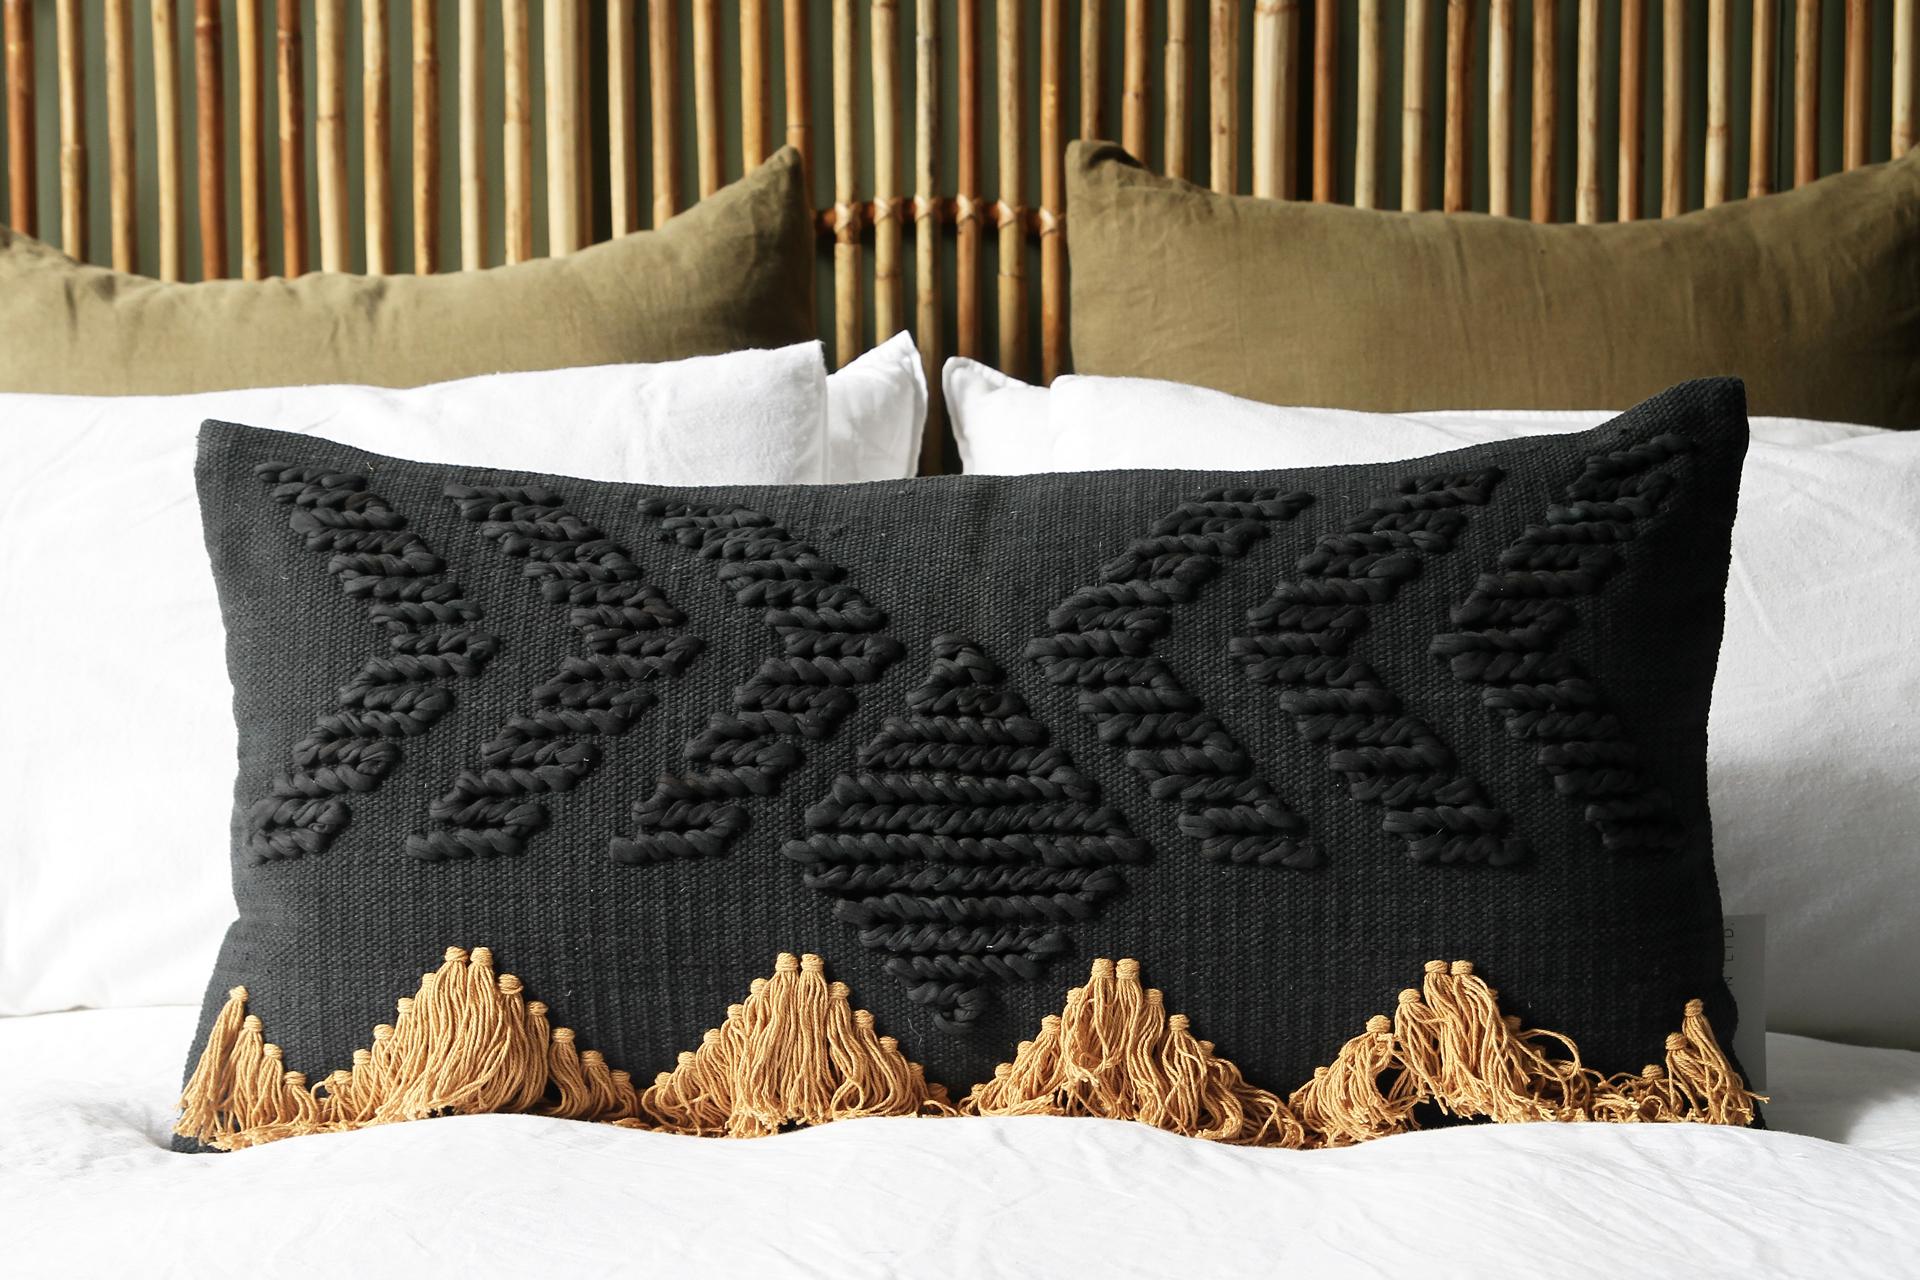 Fringe Rectangular Cushion Black With Tan Naturally